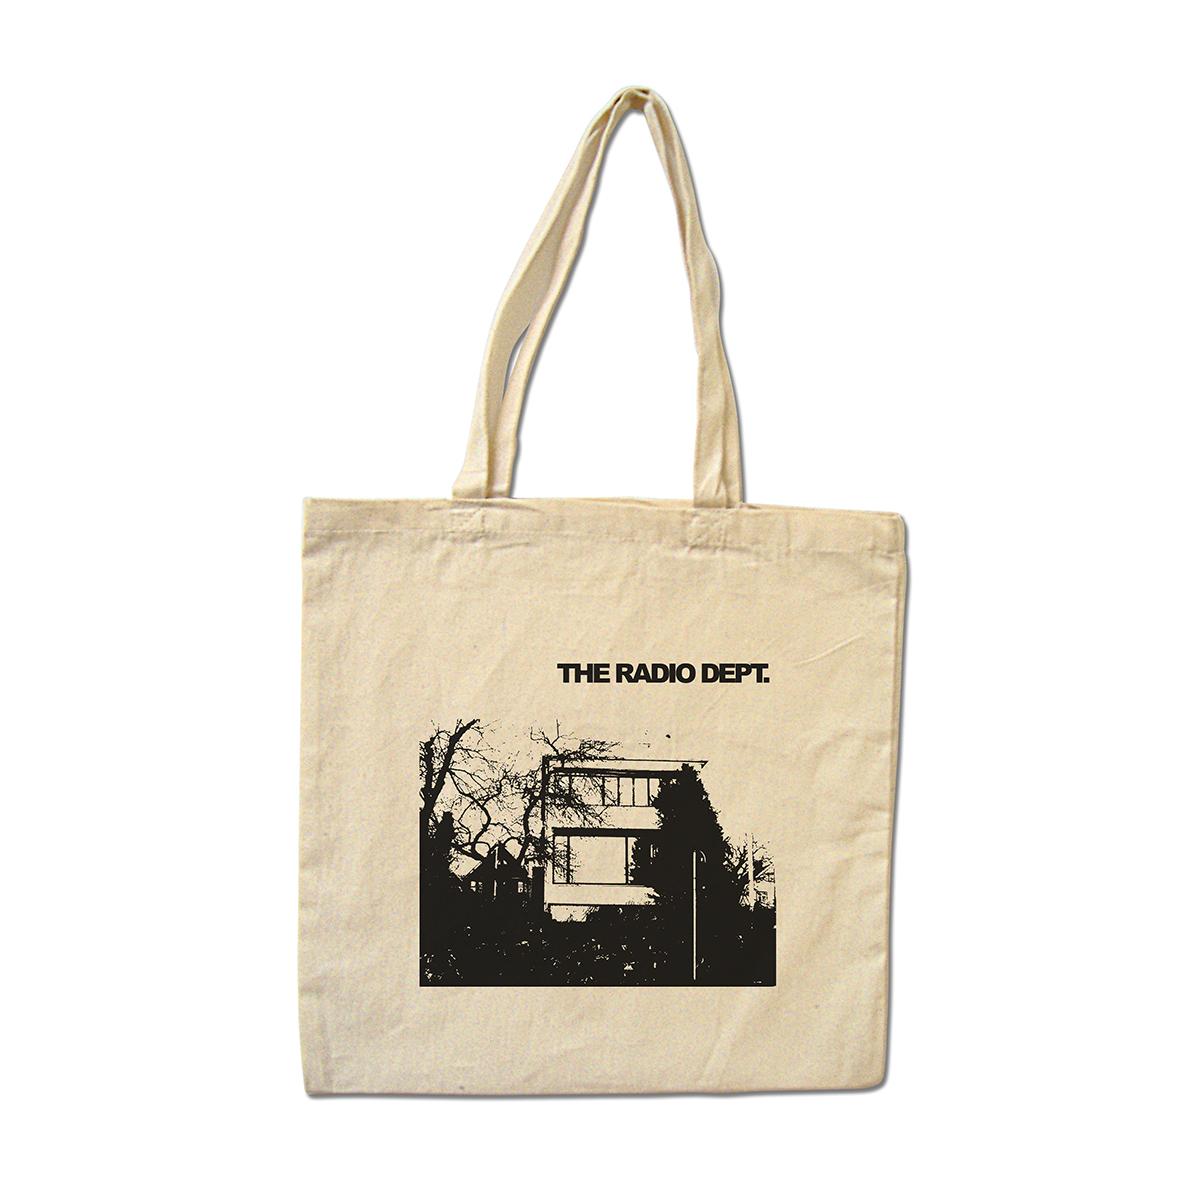 House Tote Bag - The Radio Dept.